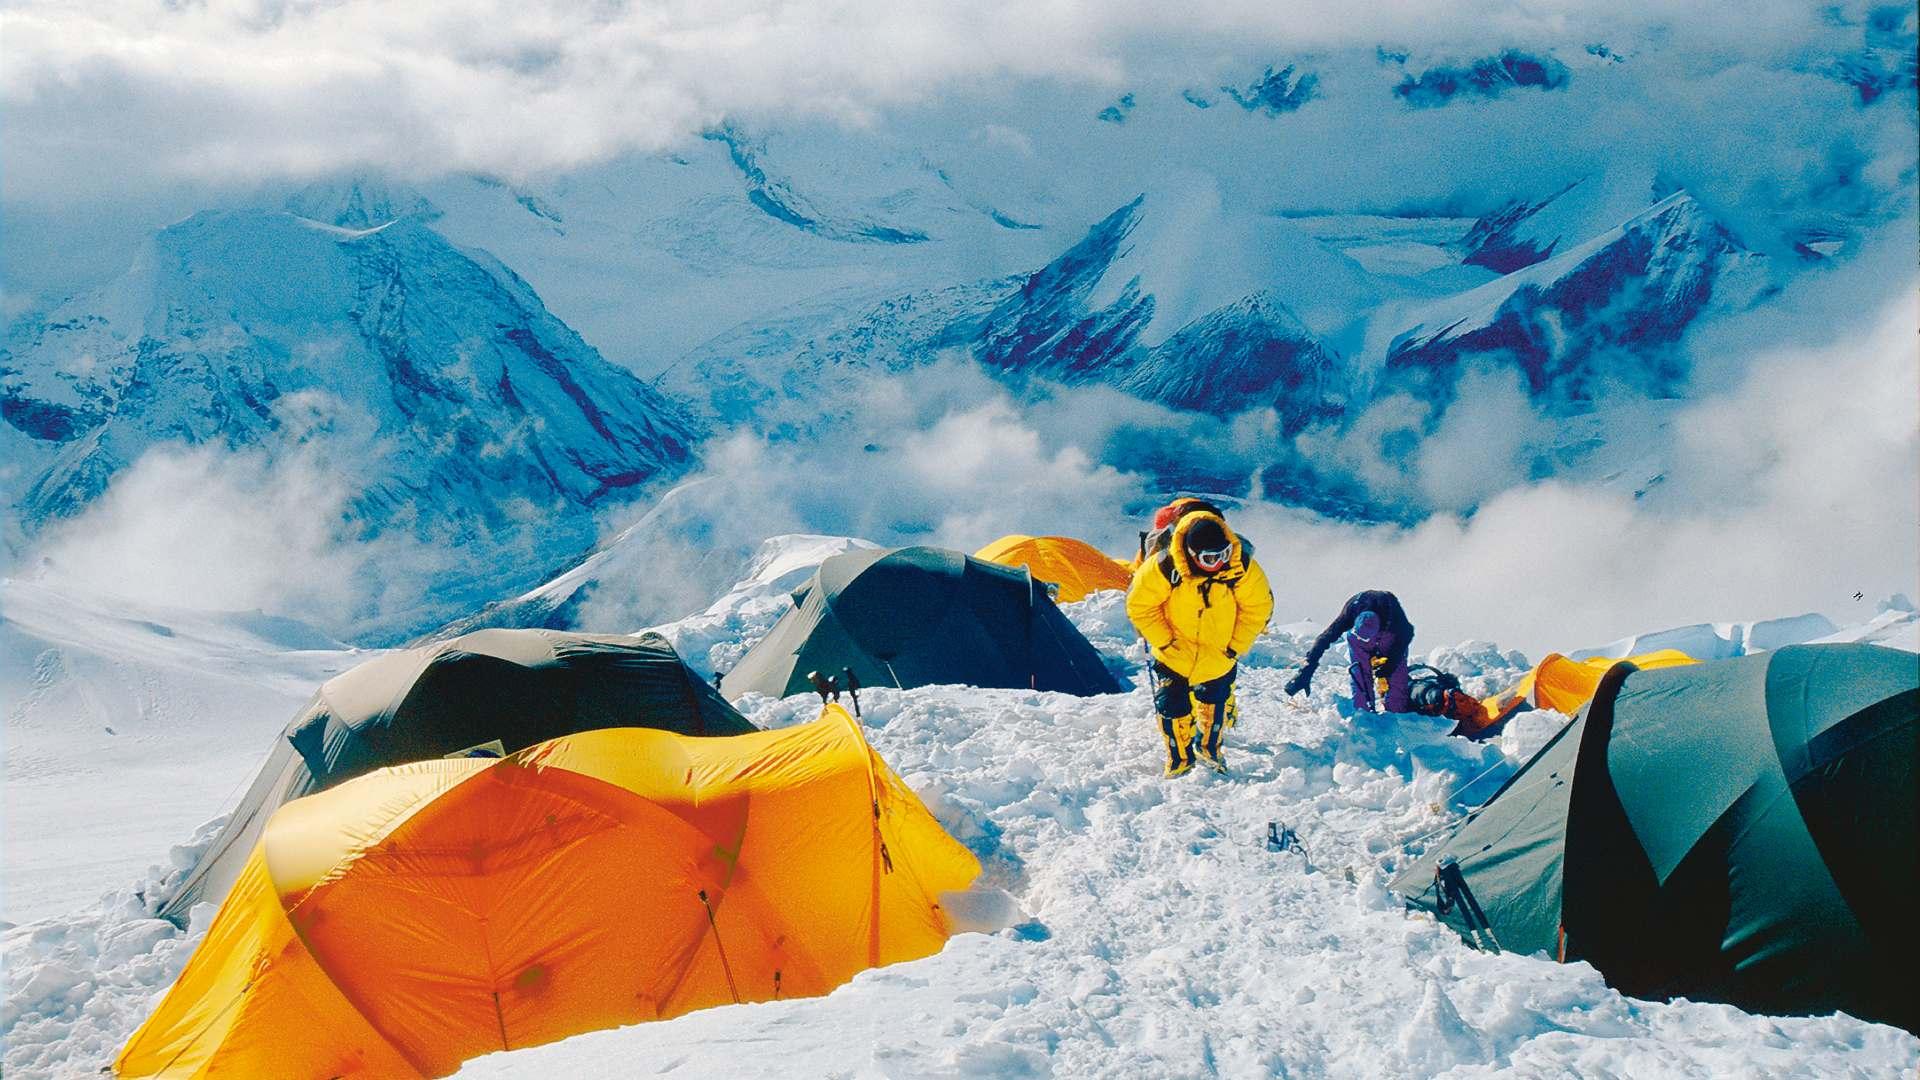 Cho Oyu, Camp3, 7500 m